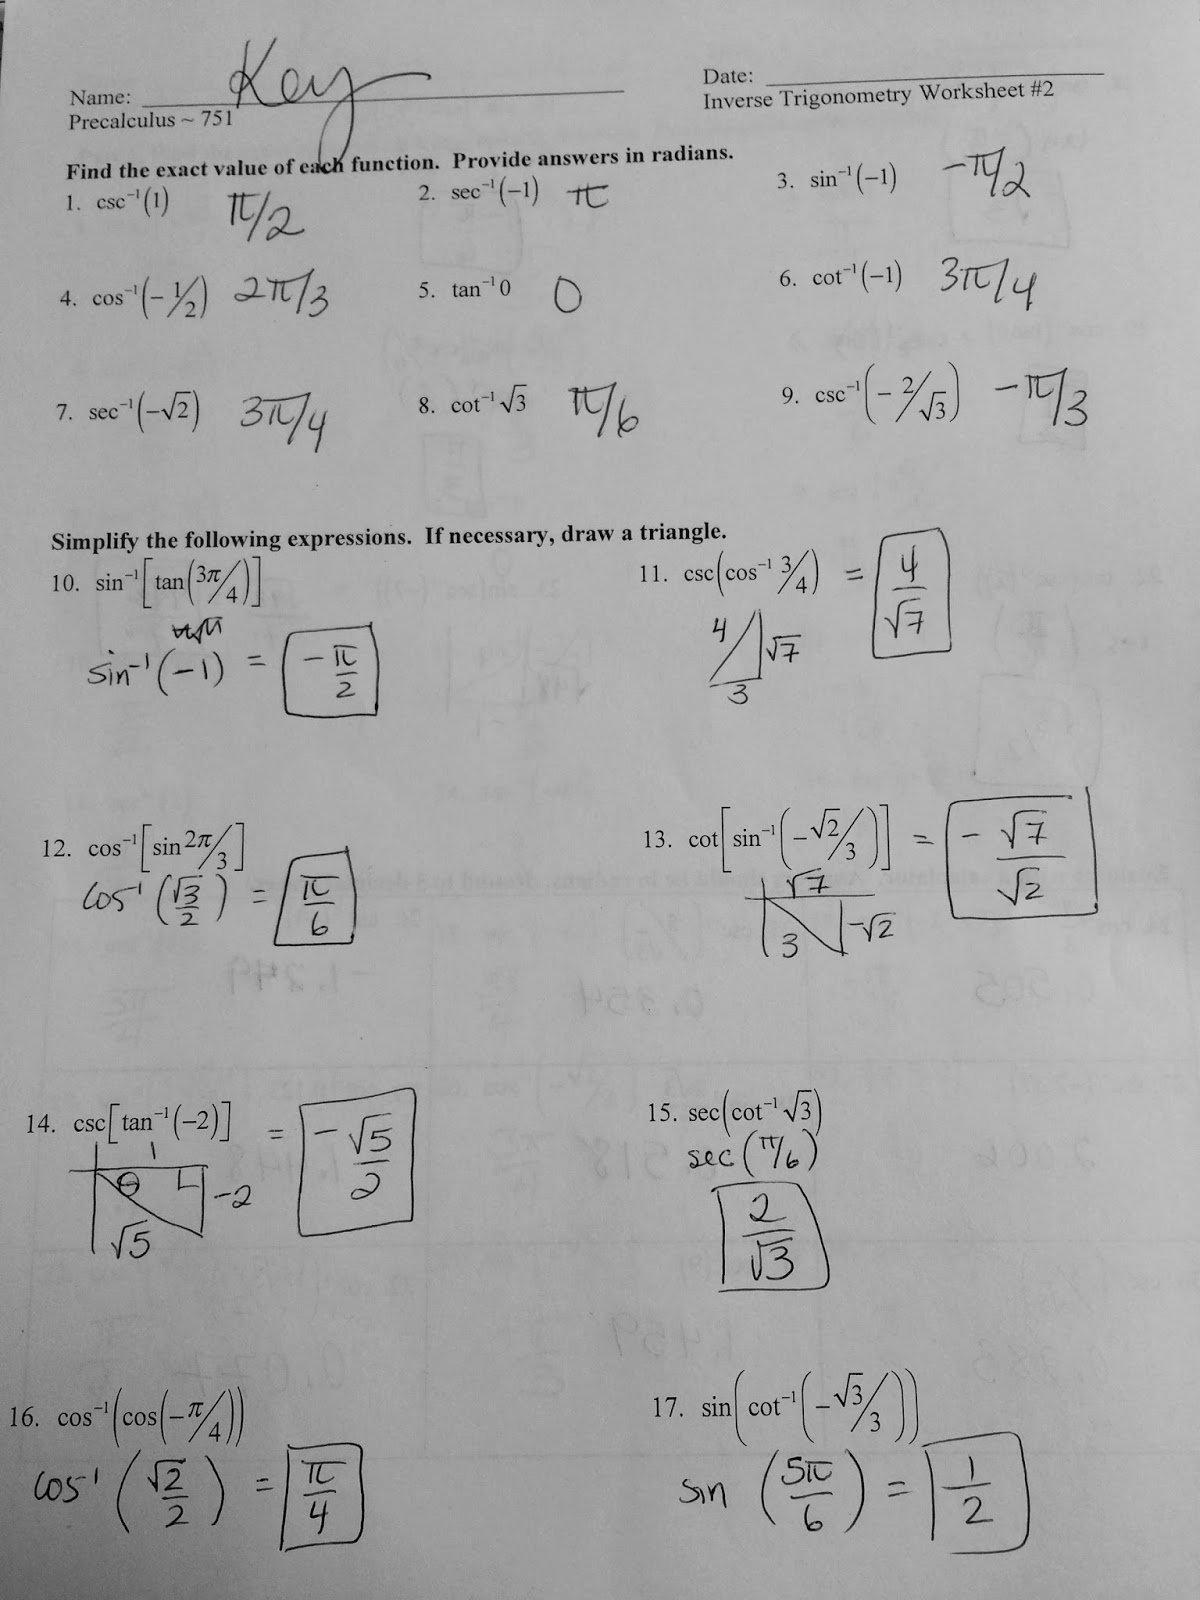 Inverse Functions Worksheet Precalculus The Best Worksheets Image In Precalculus Inverse Functions Worksheet Answers